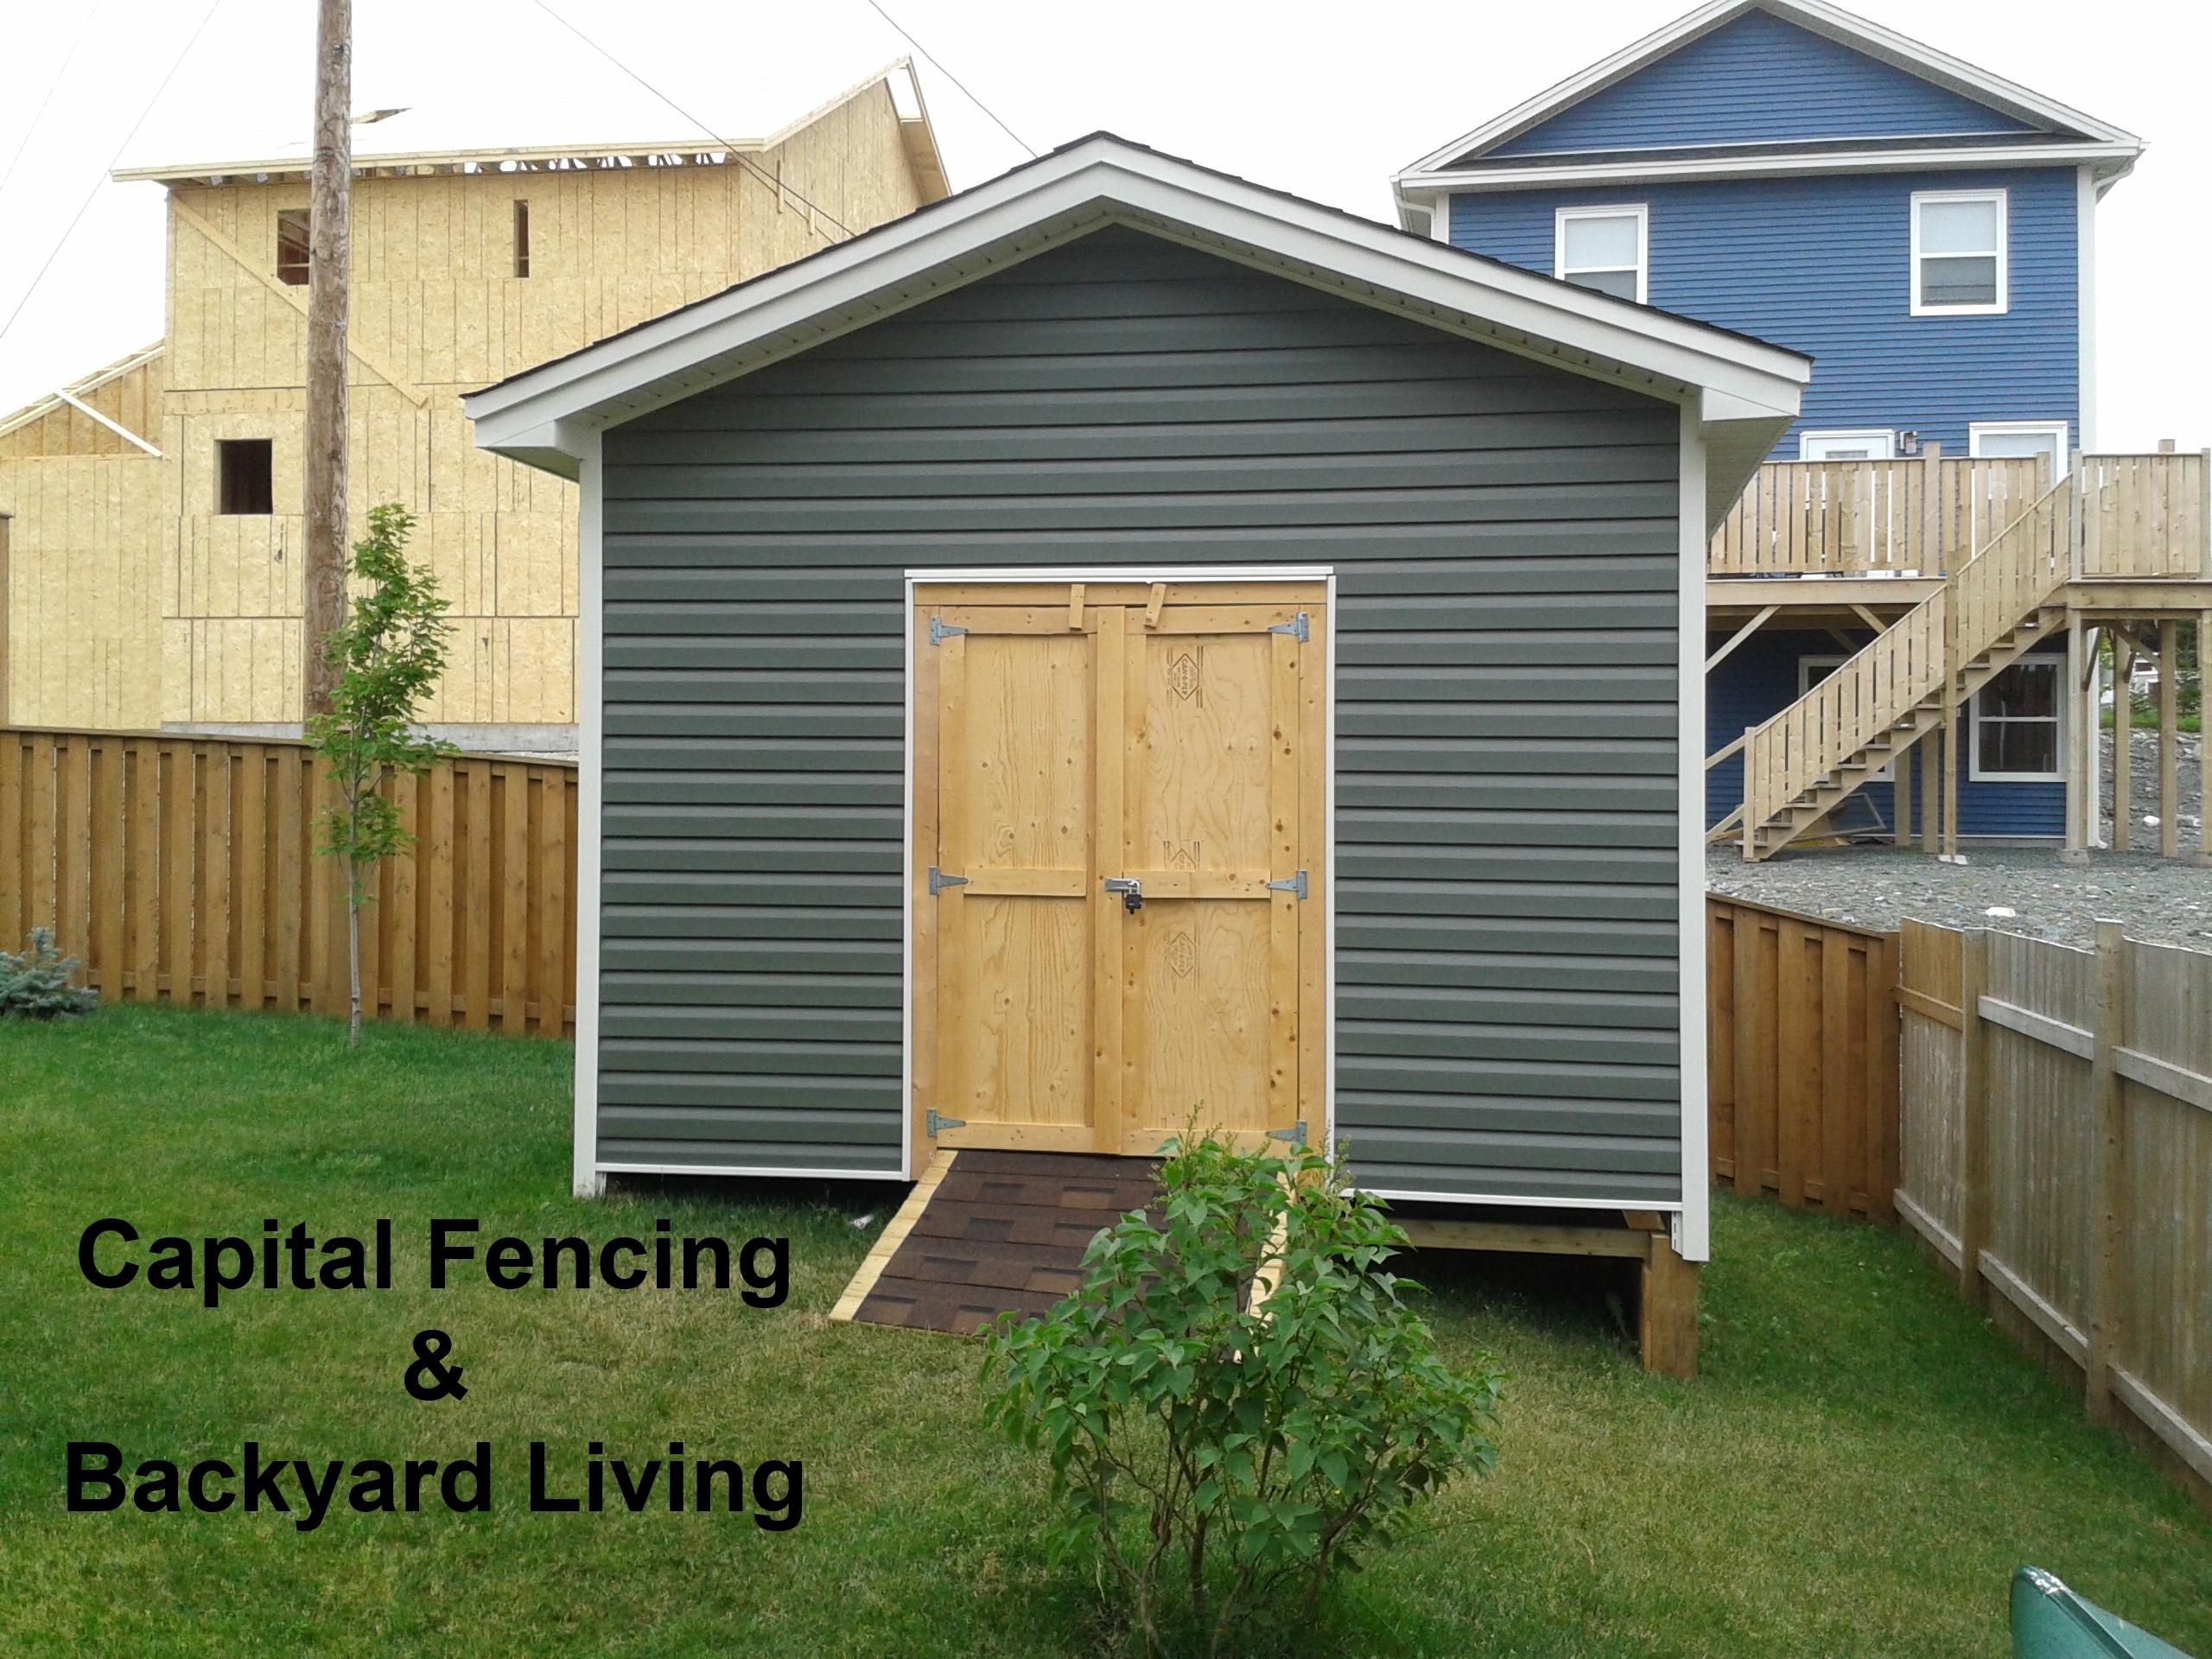 Sheds garages capital fencing and backyard living 12x12 overhead garage door